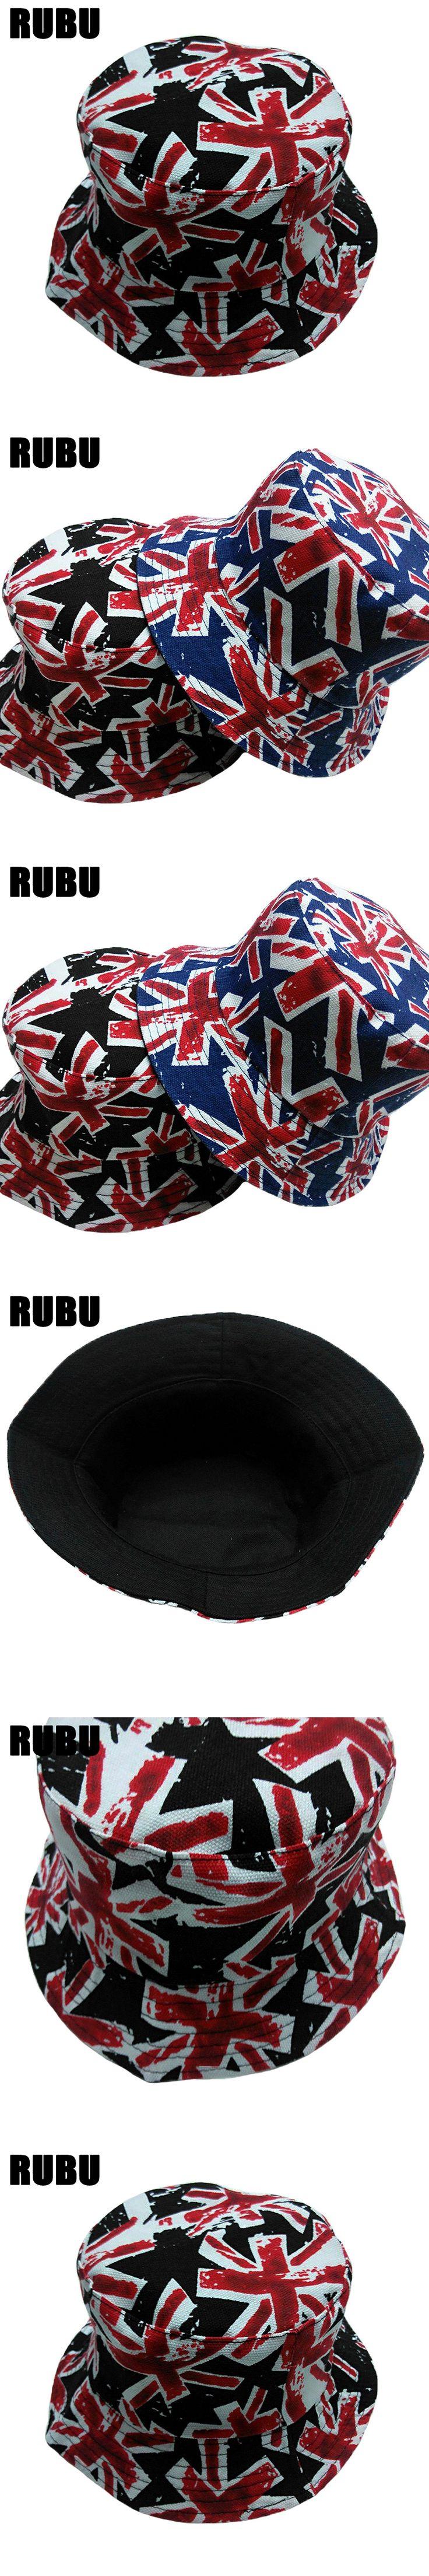 2017 Fashion Print Flag Bucket hat Men Hip Hop Sun Hats Cotton Fisherman Bucket Hat Women Brand Men Camo Bucket Hat